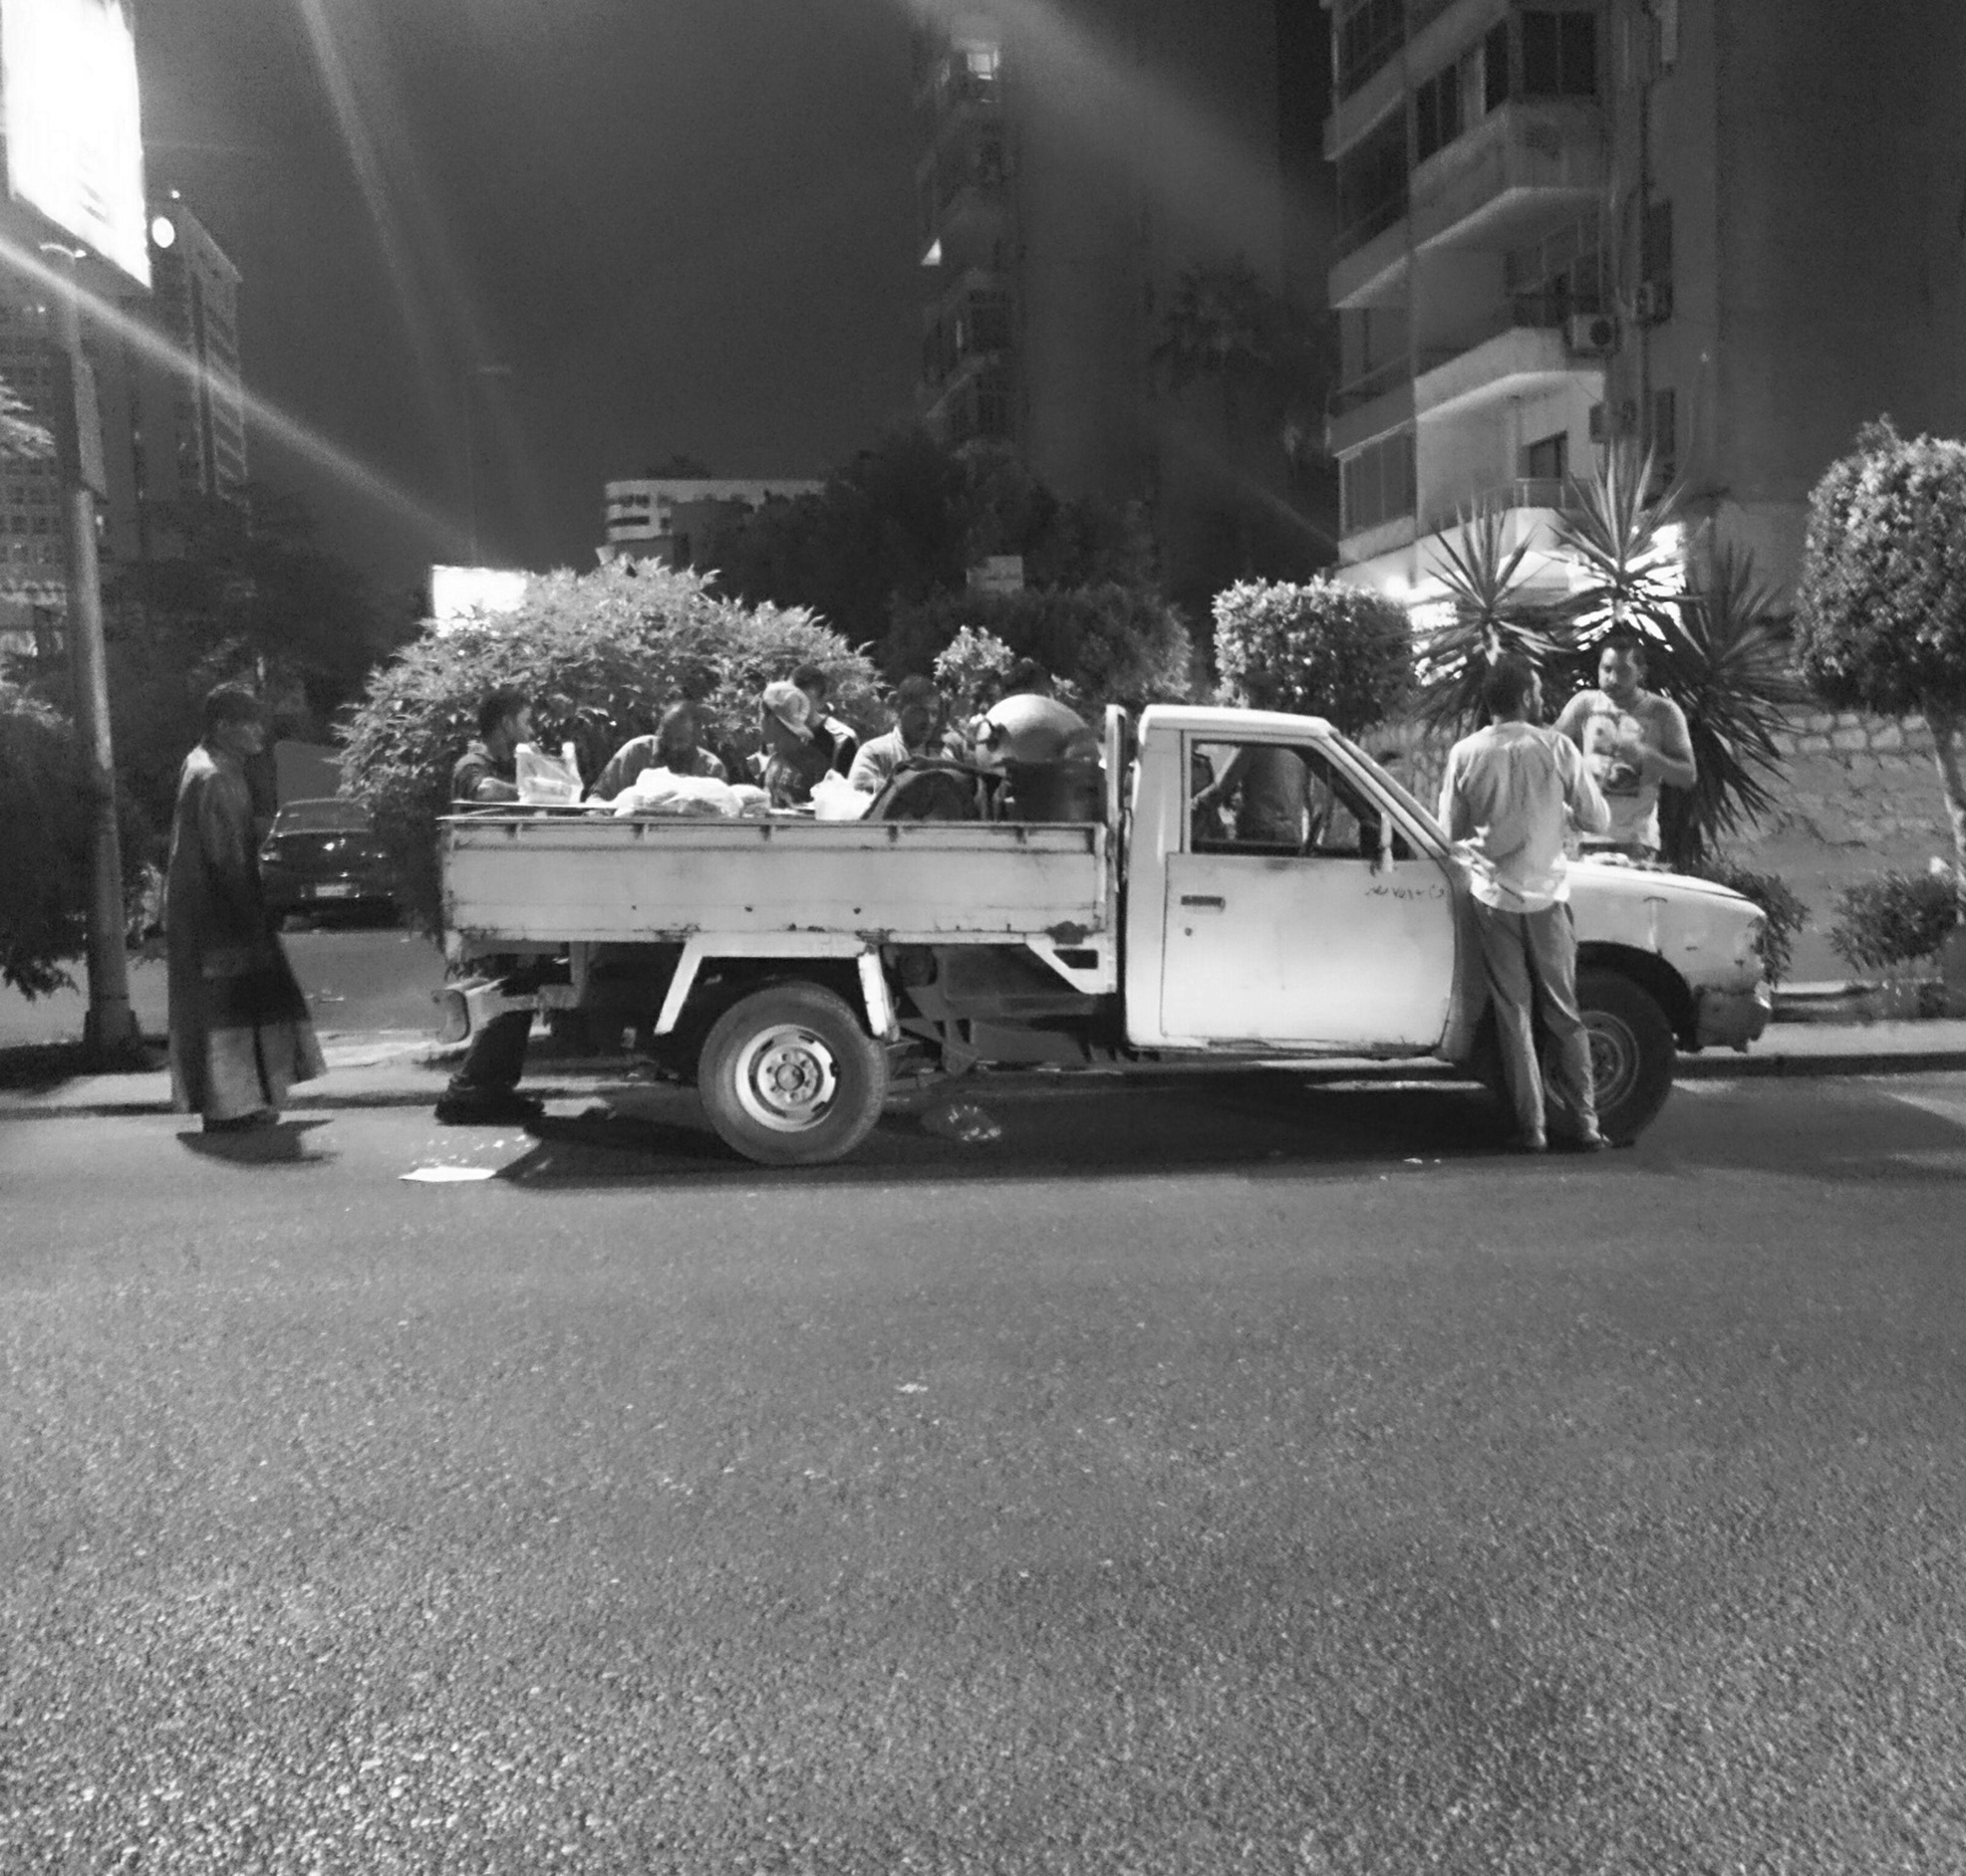 So7oor Ramdan🎉🎉 Ramadan Mubarak Ramadan Kareem Ramadan2017 Food Eating Old Car Street Car Outdoors Night Road Men People City Cairo Egypt Nasr_city EyeEmNewHere Mobilephotography Sony Xperia Photography. Night Photography Late The Street Photographer - 2017 EyeEm Awards